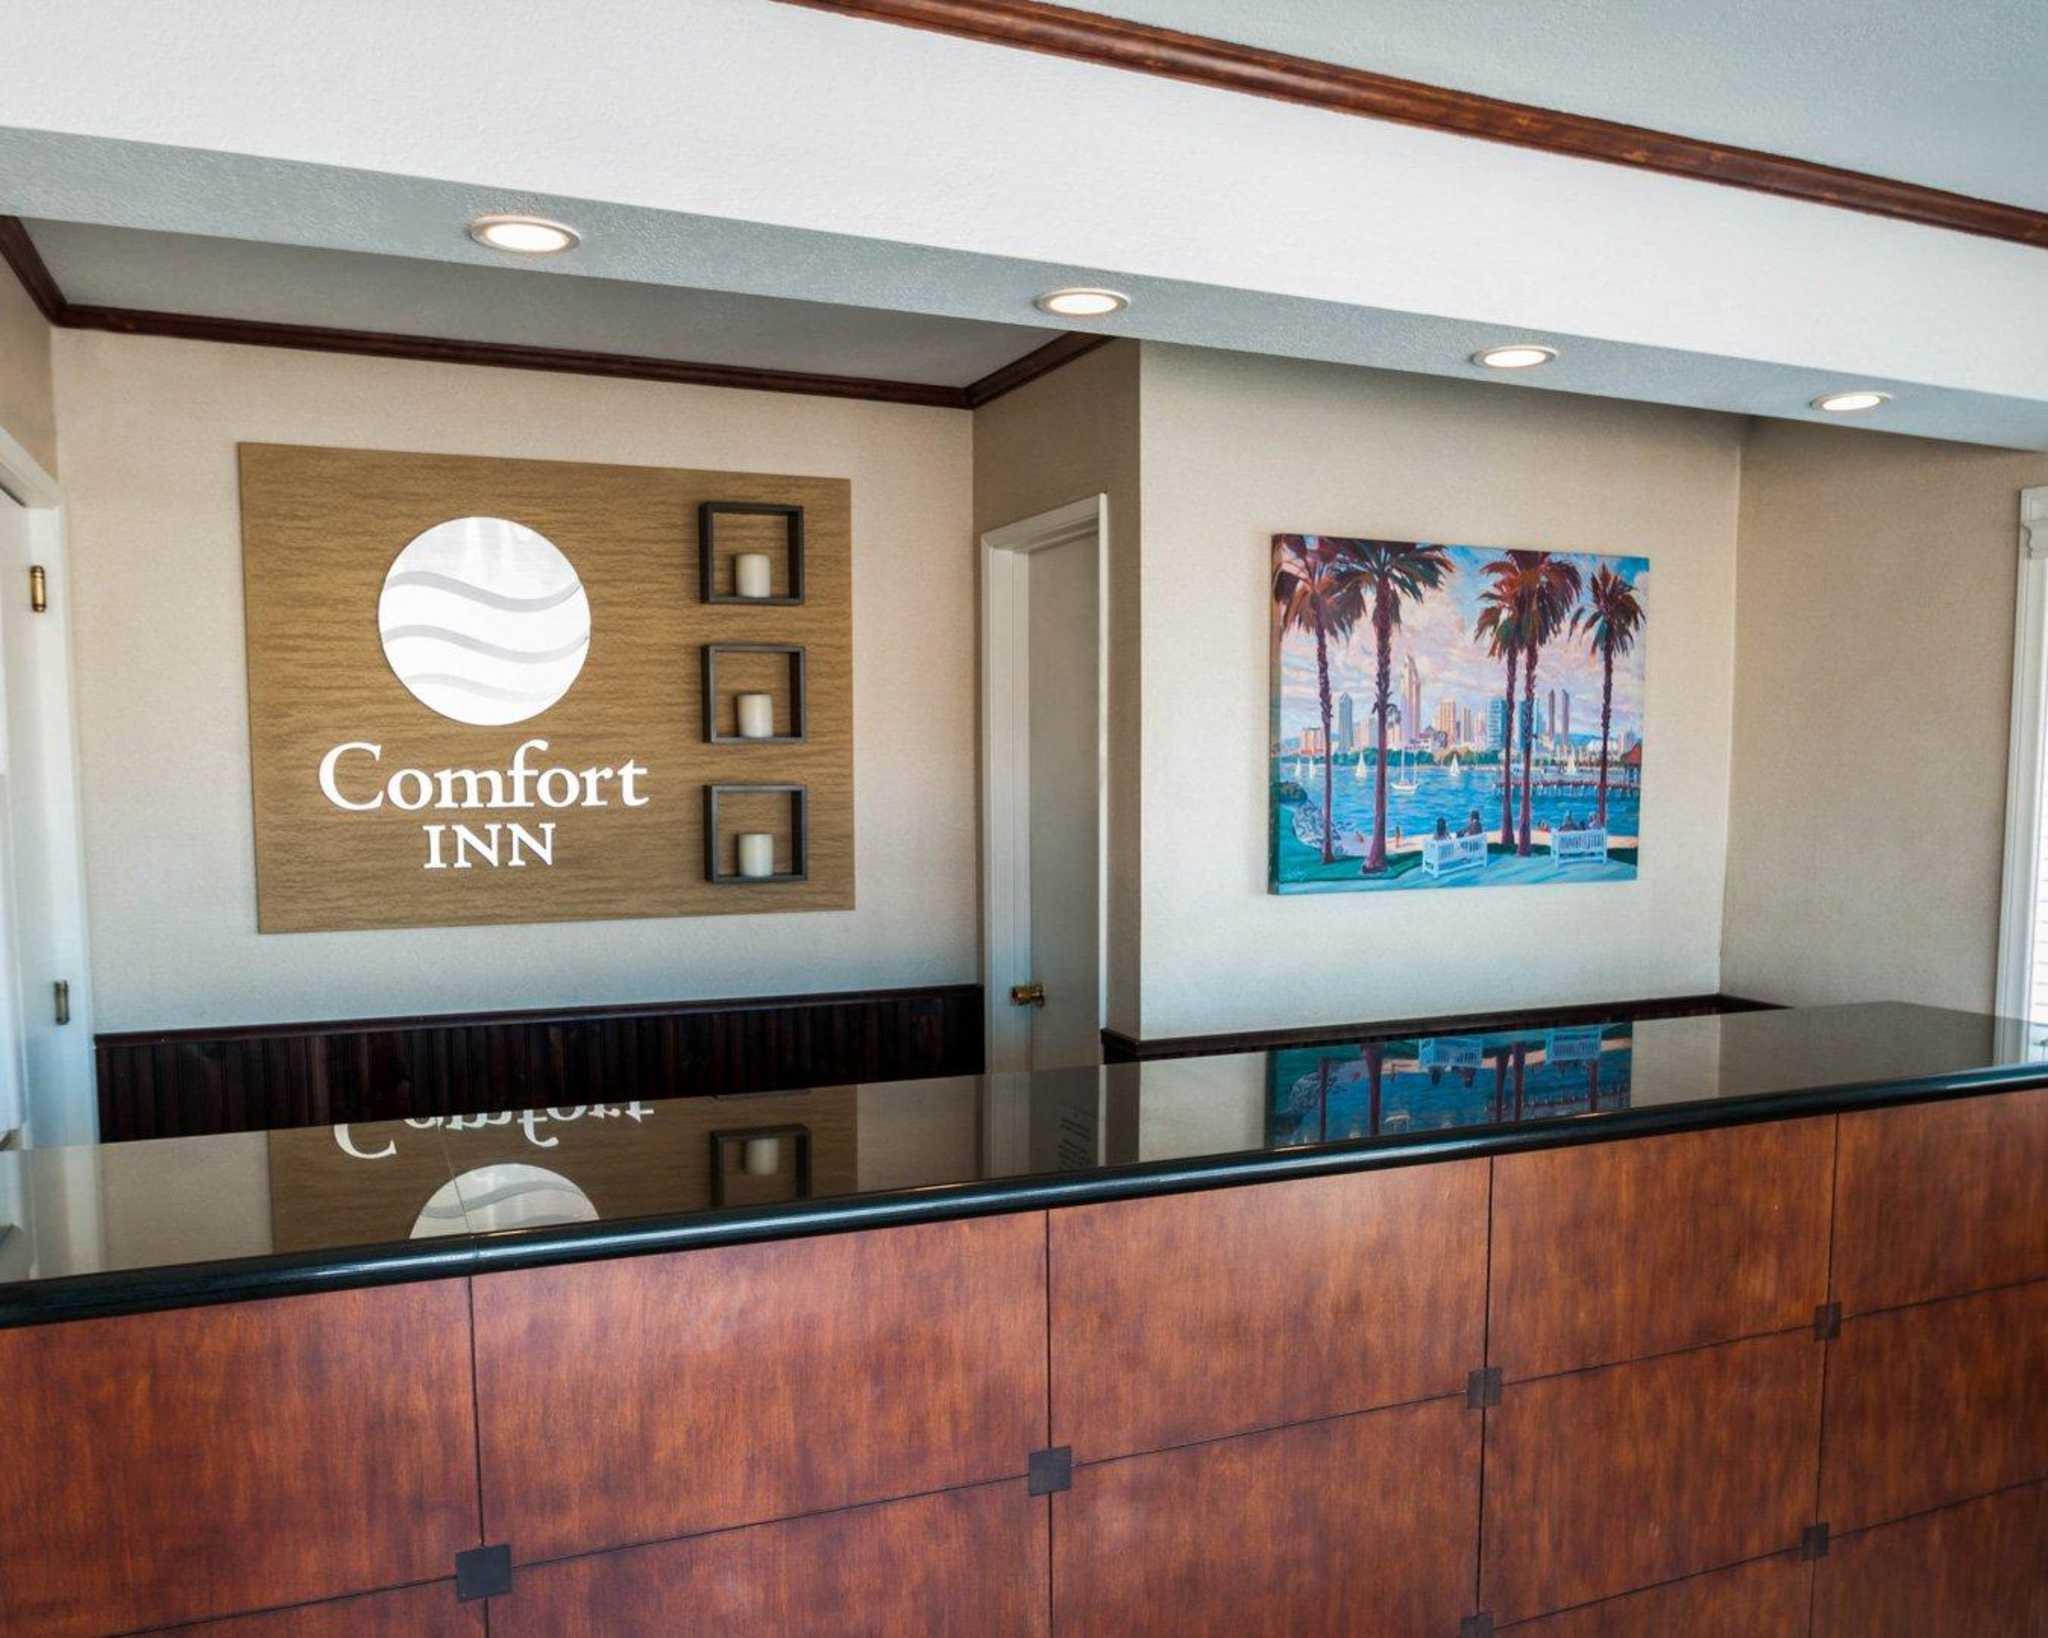 Comfort Inn San Diego At The Harbor image 16